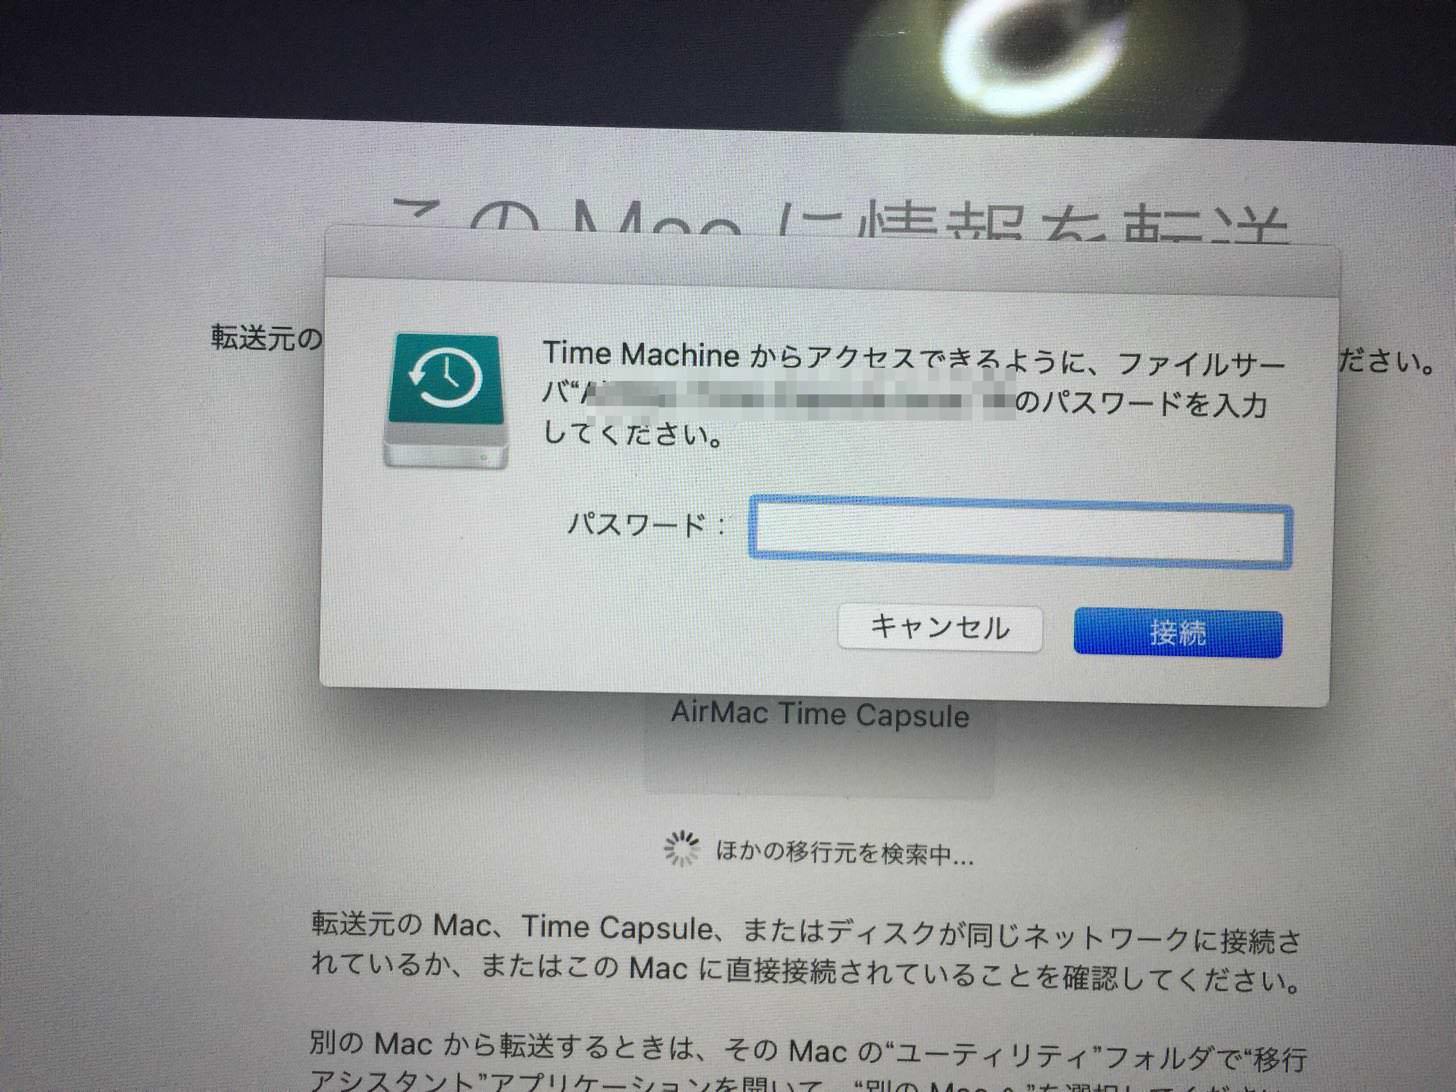 Time Machineのパスワードを入力